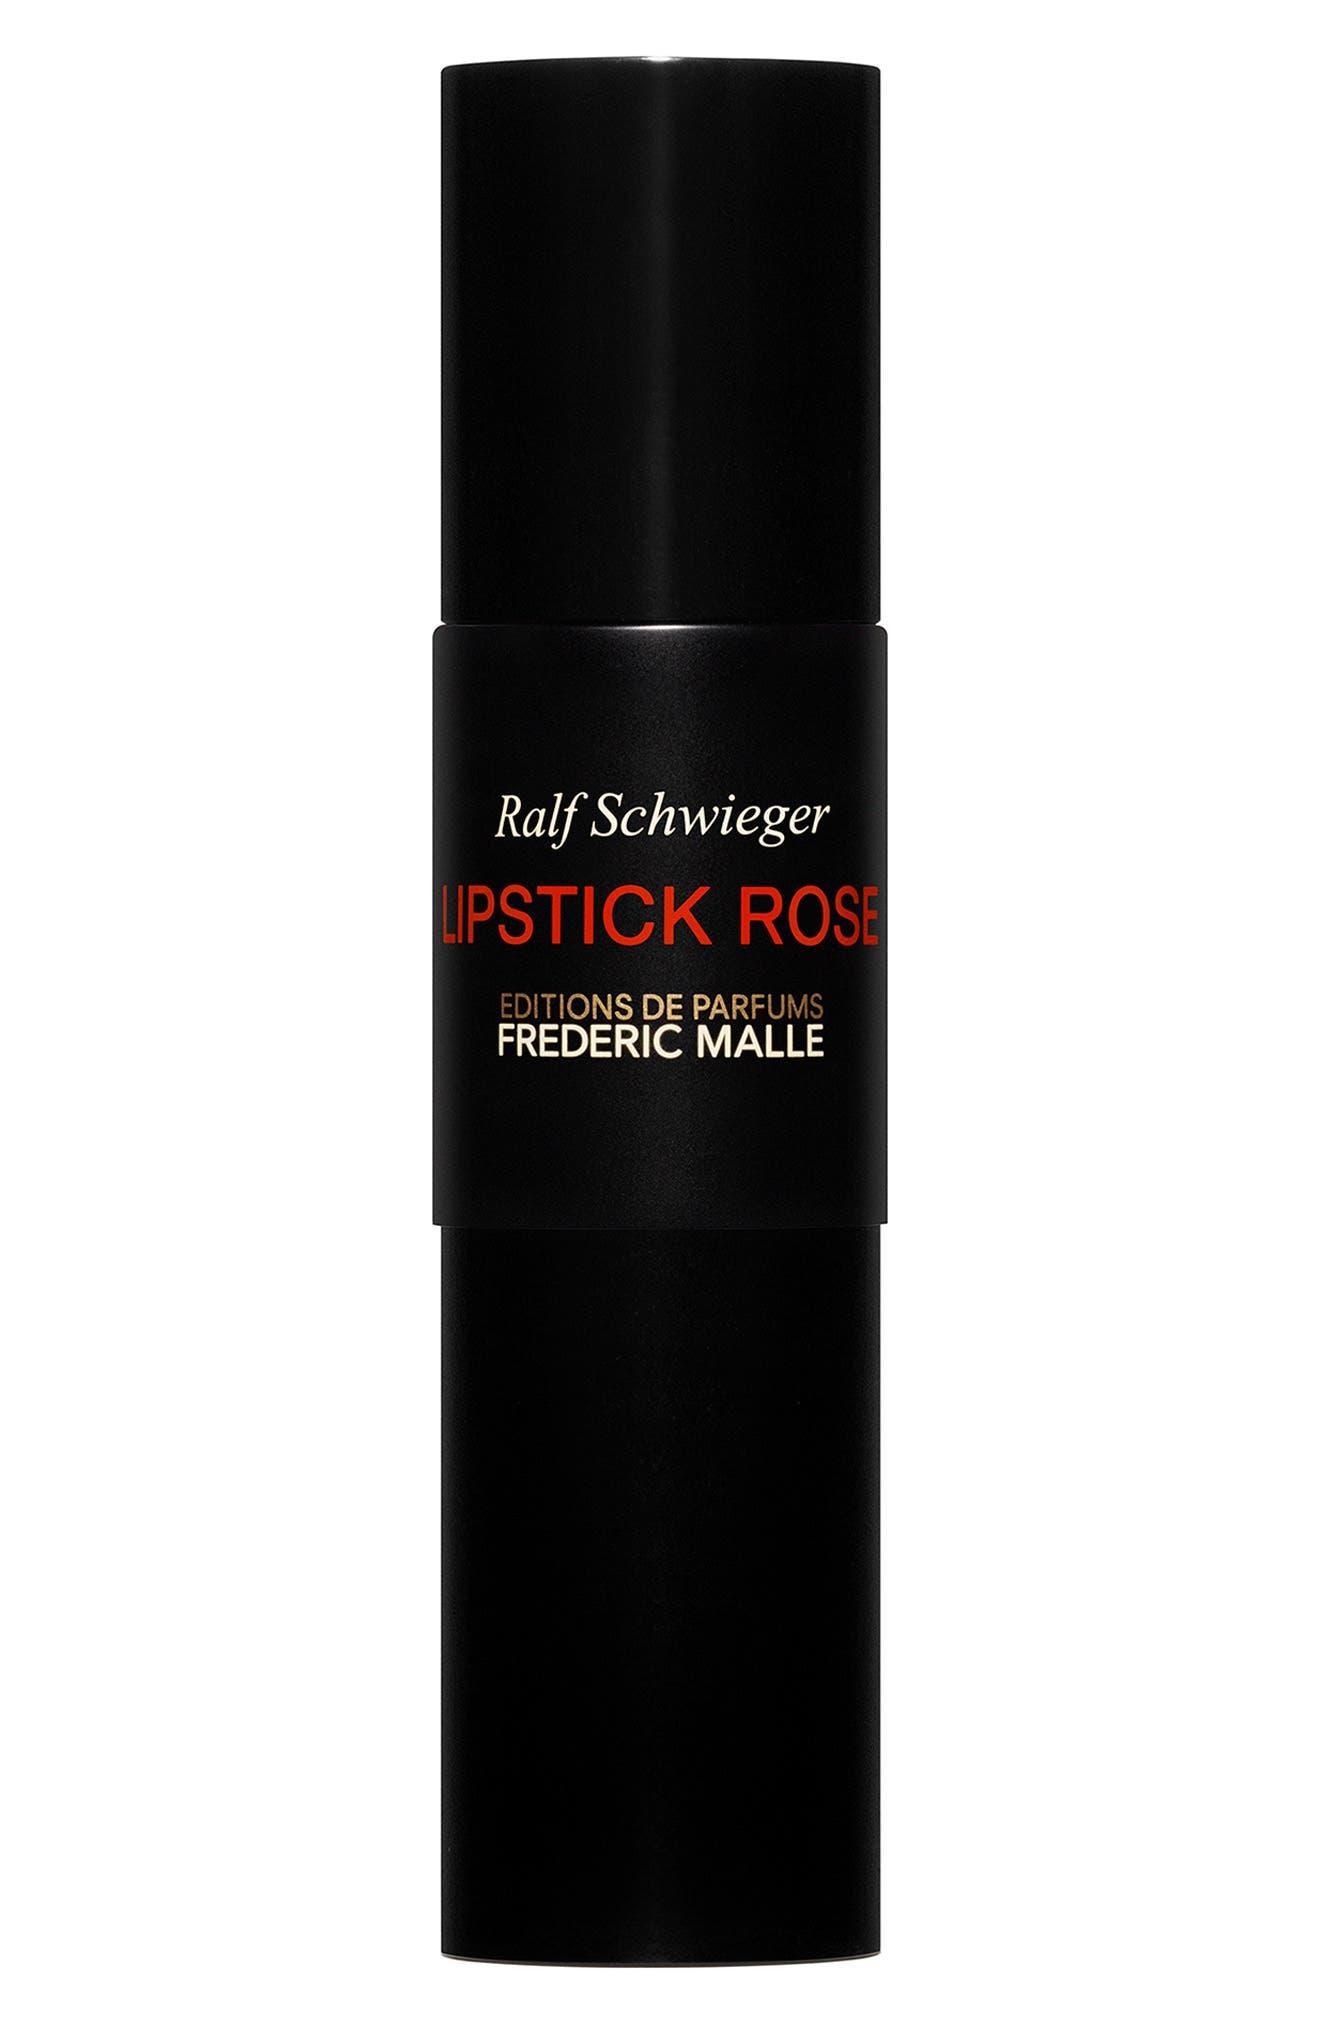 Lipstick Rose Fragrance